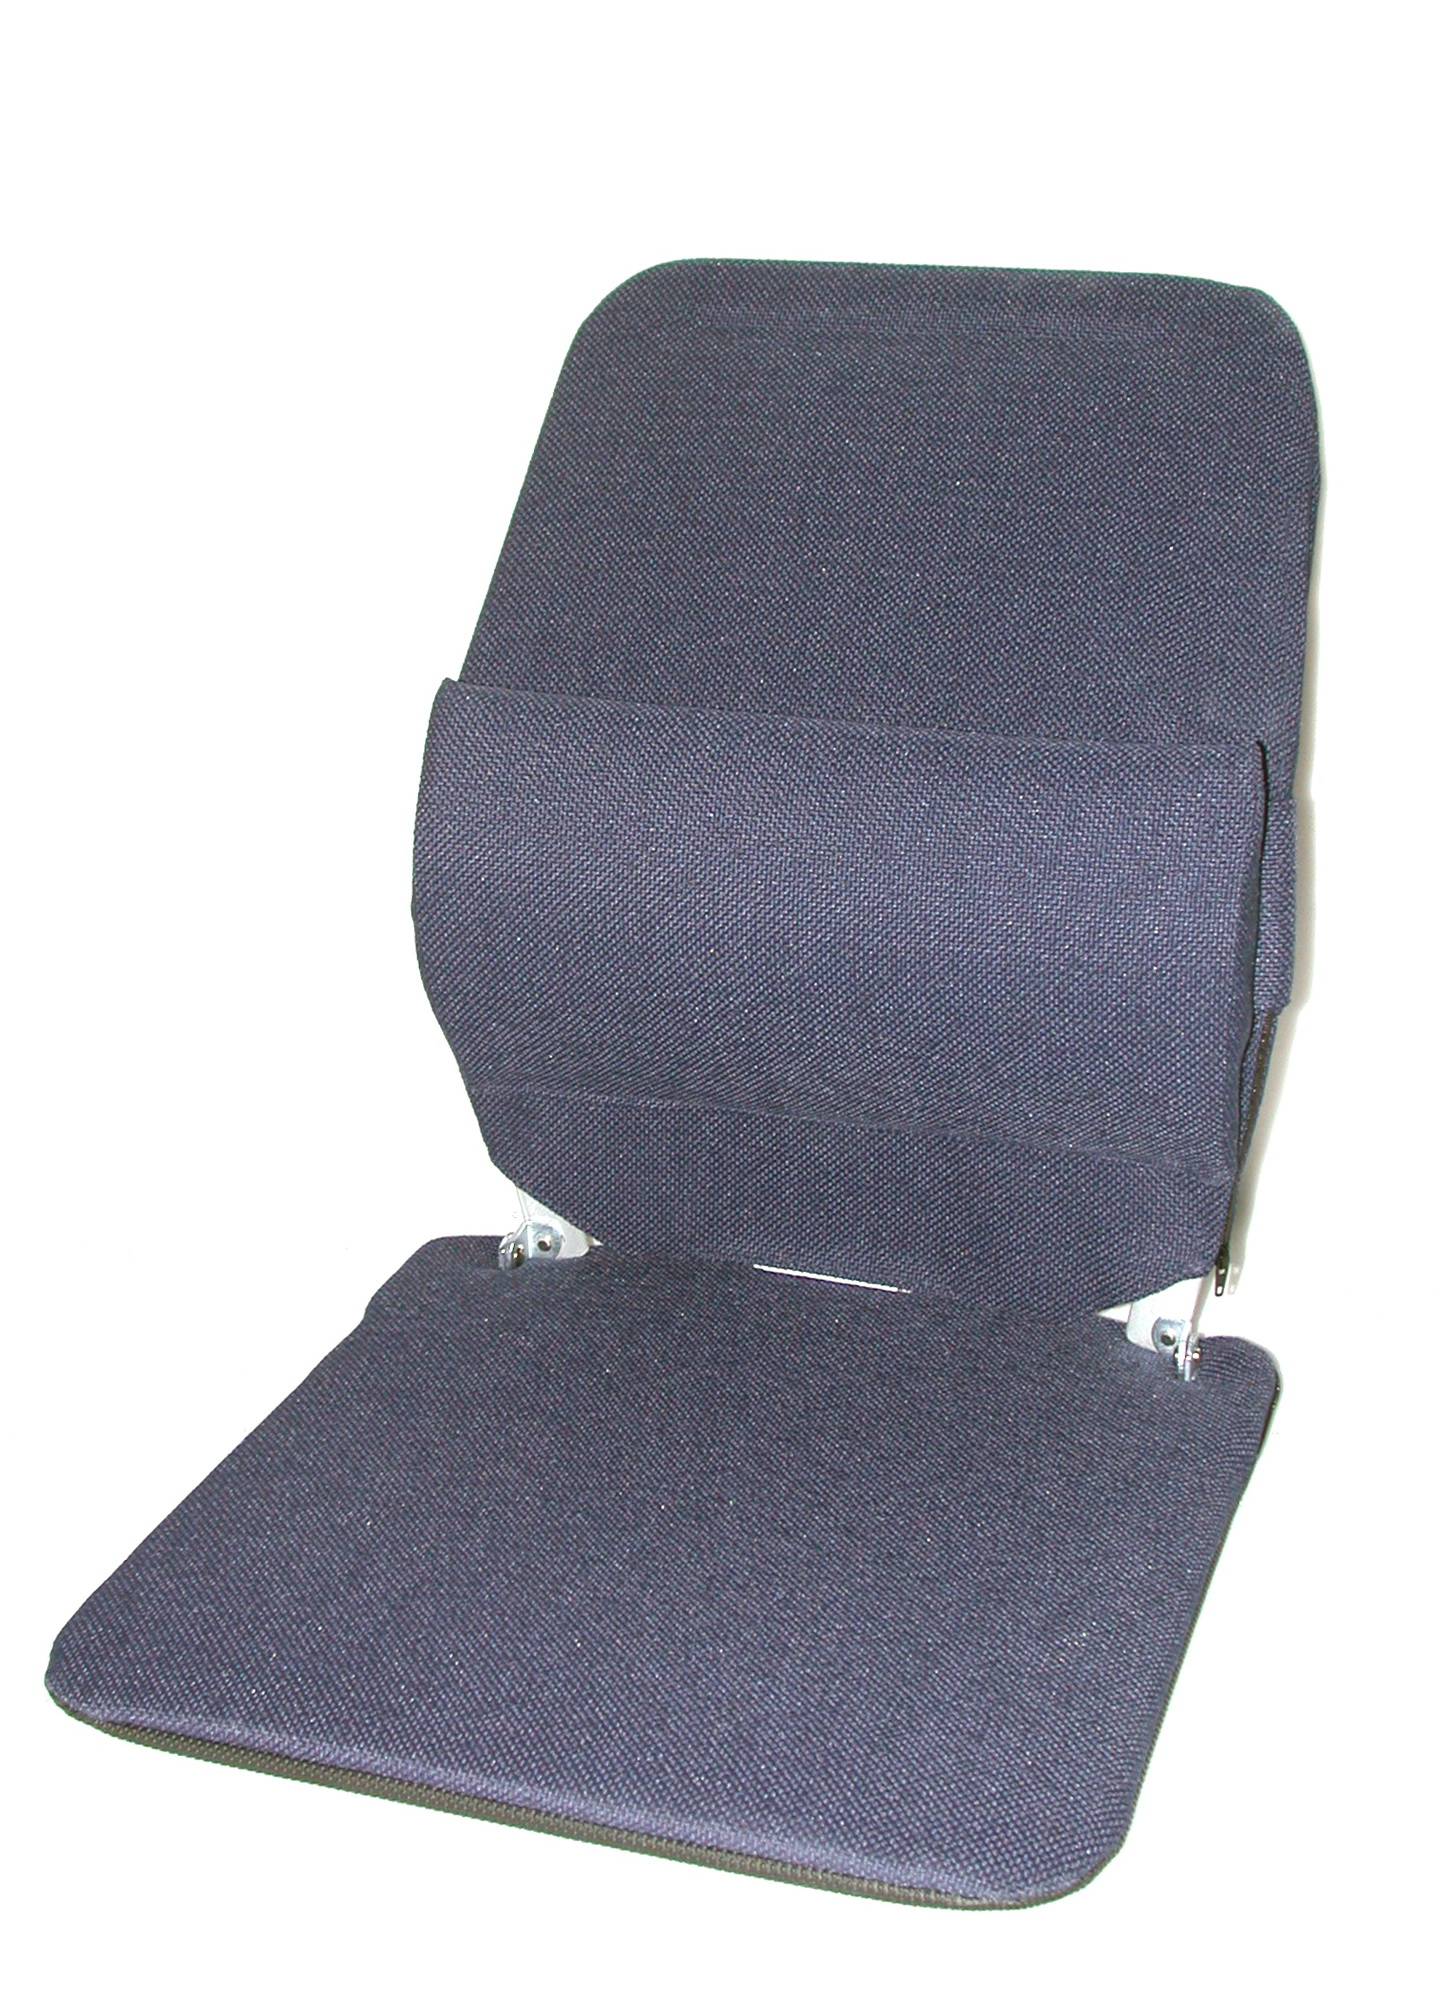 Chair Cushions For Back Pain Home Design Ideas